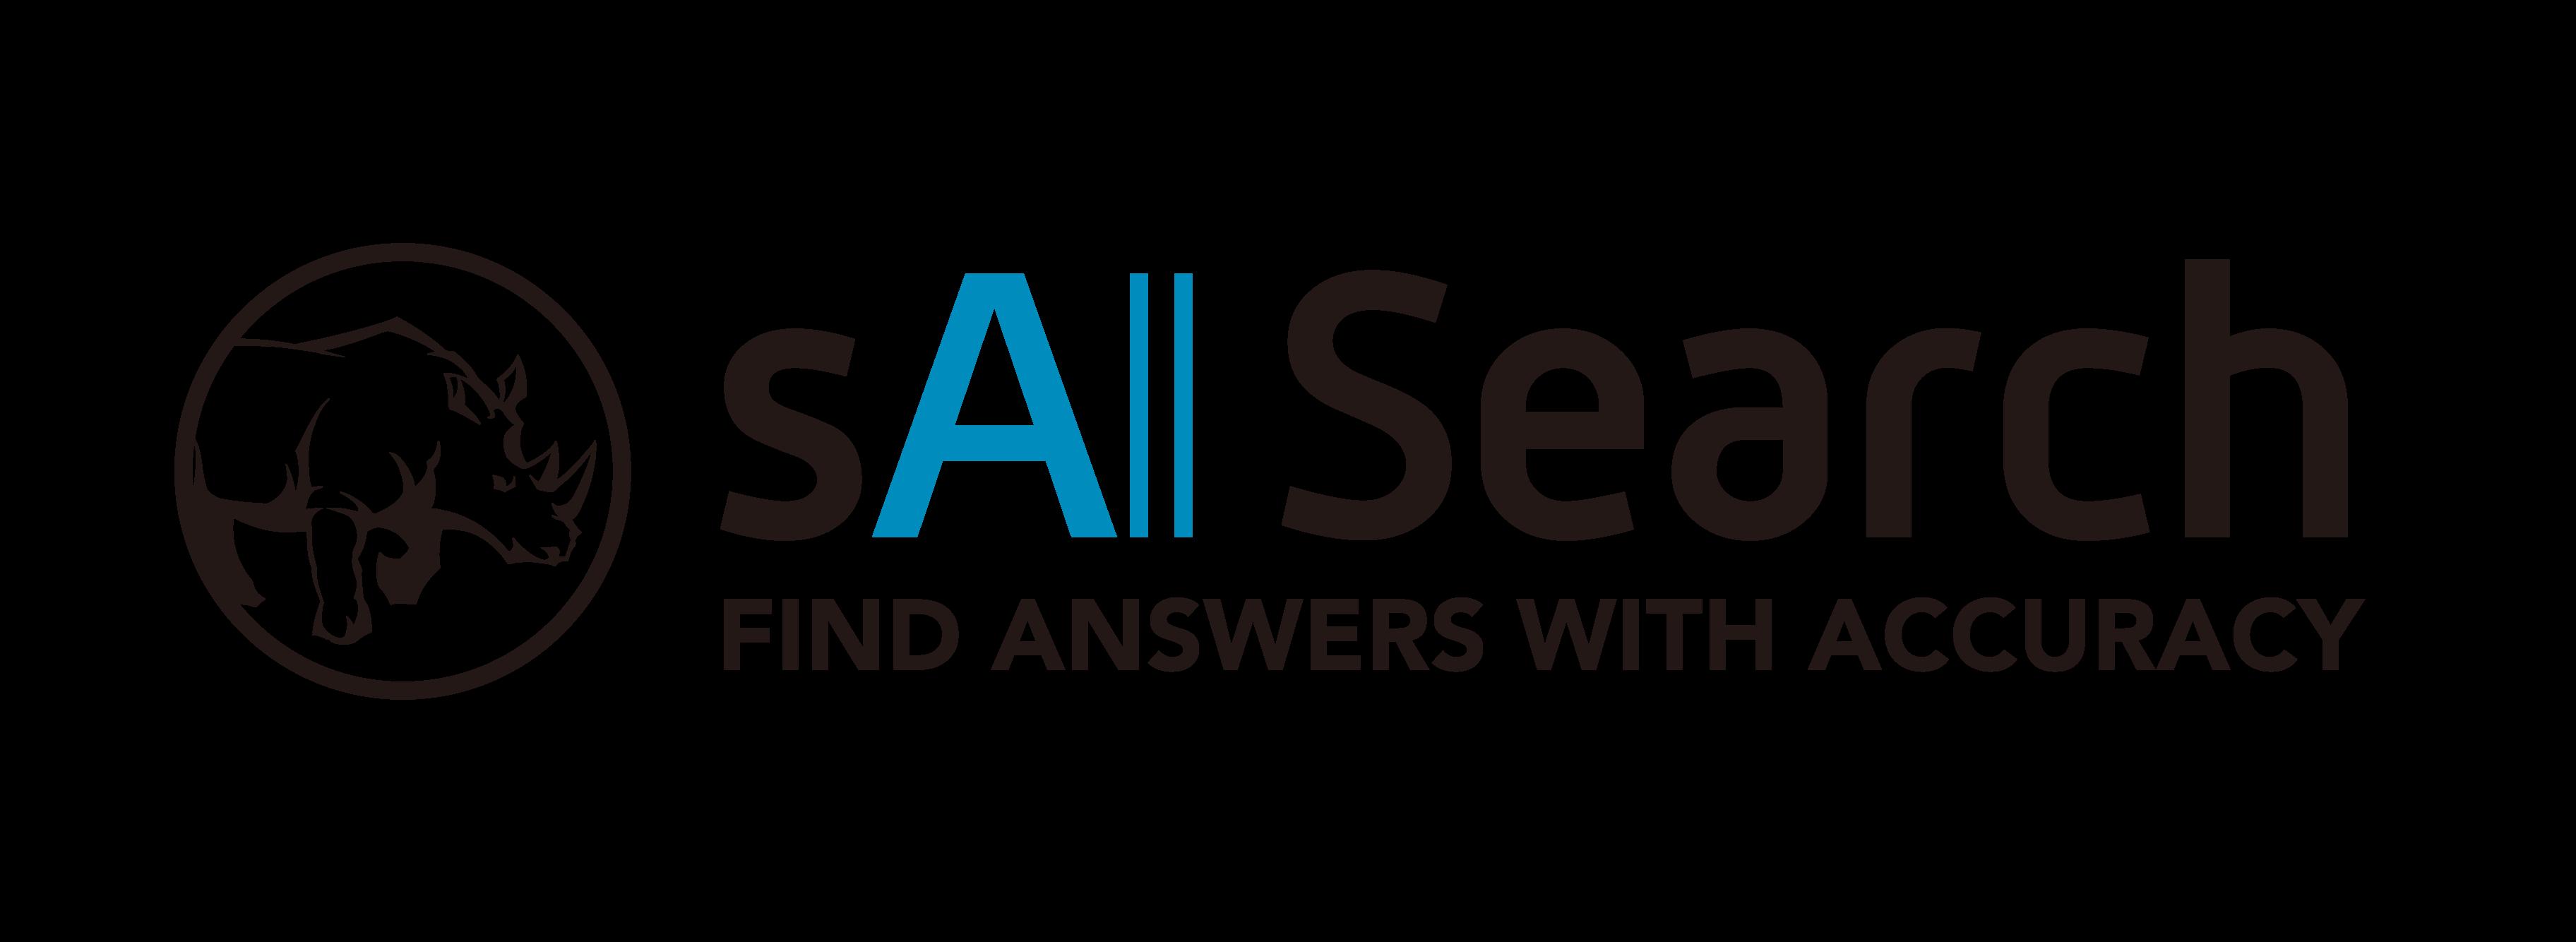 sAI Search|インタビュー掲載